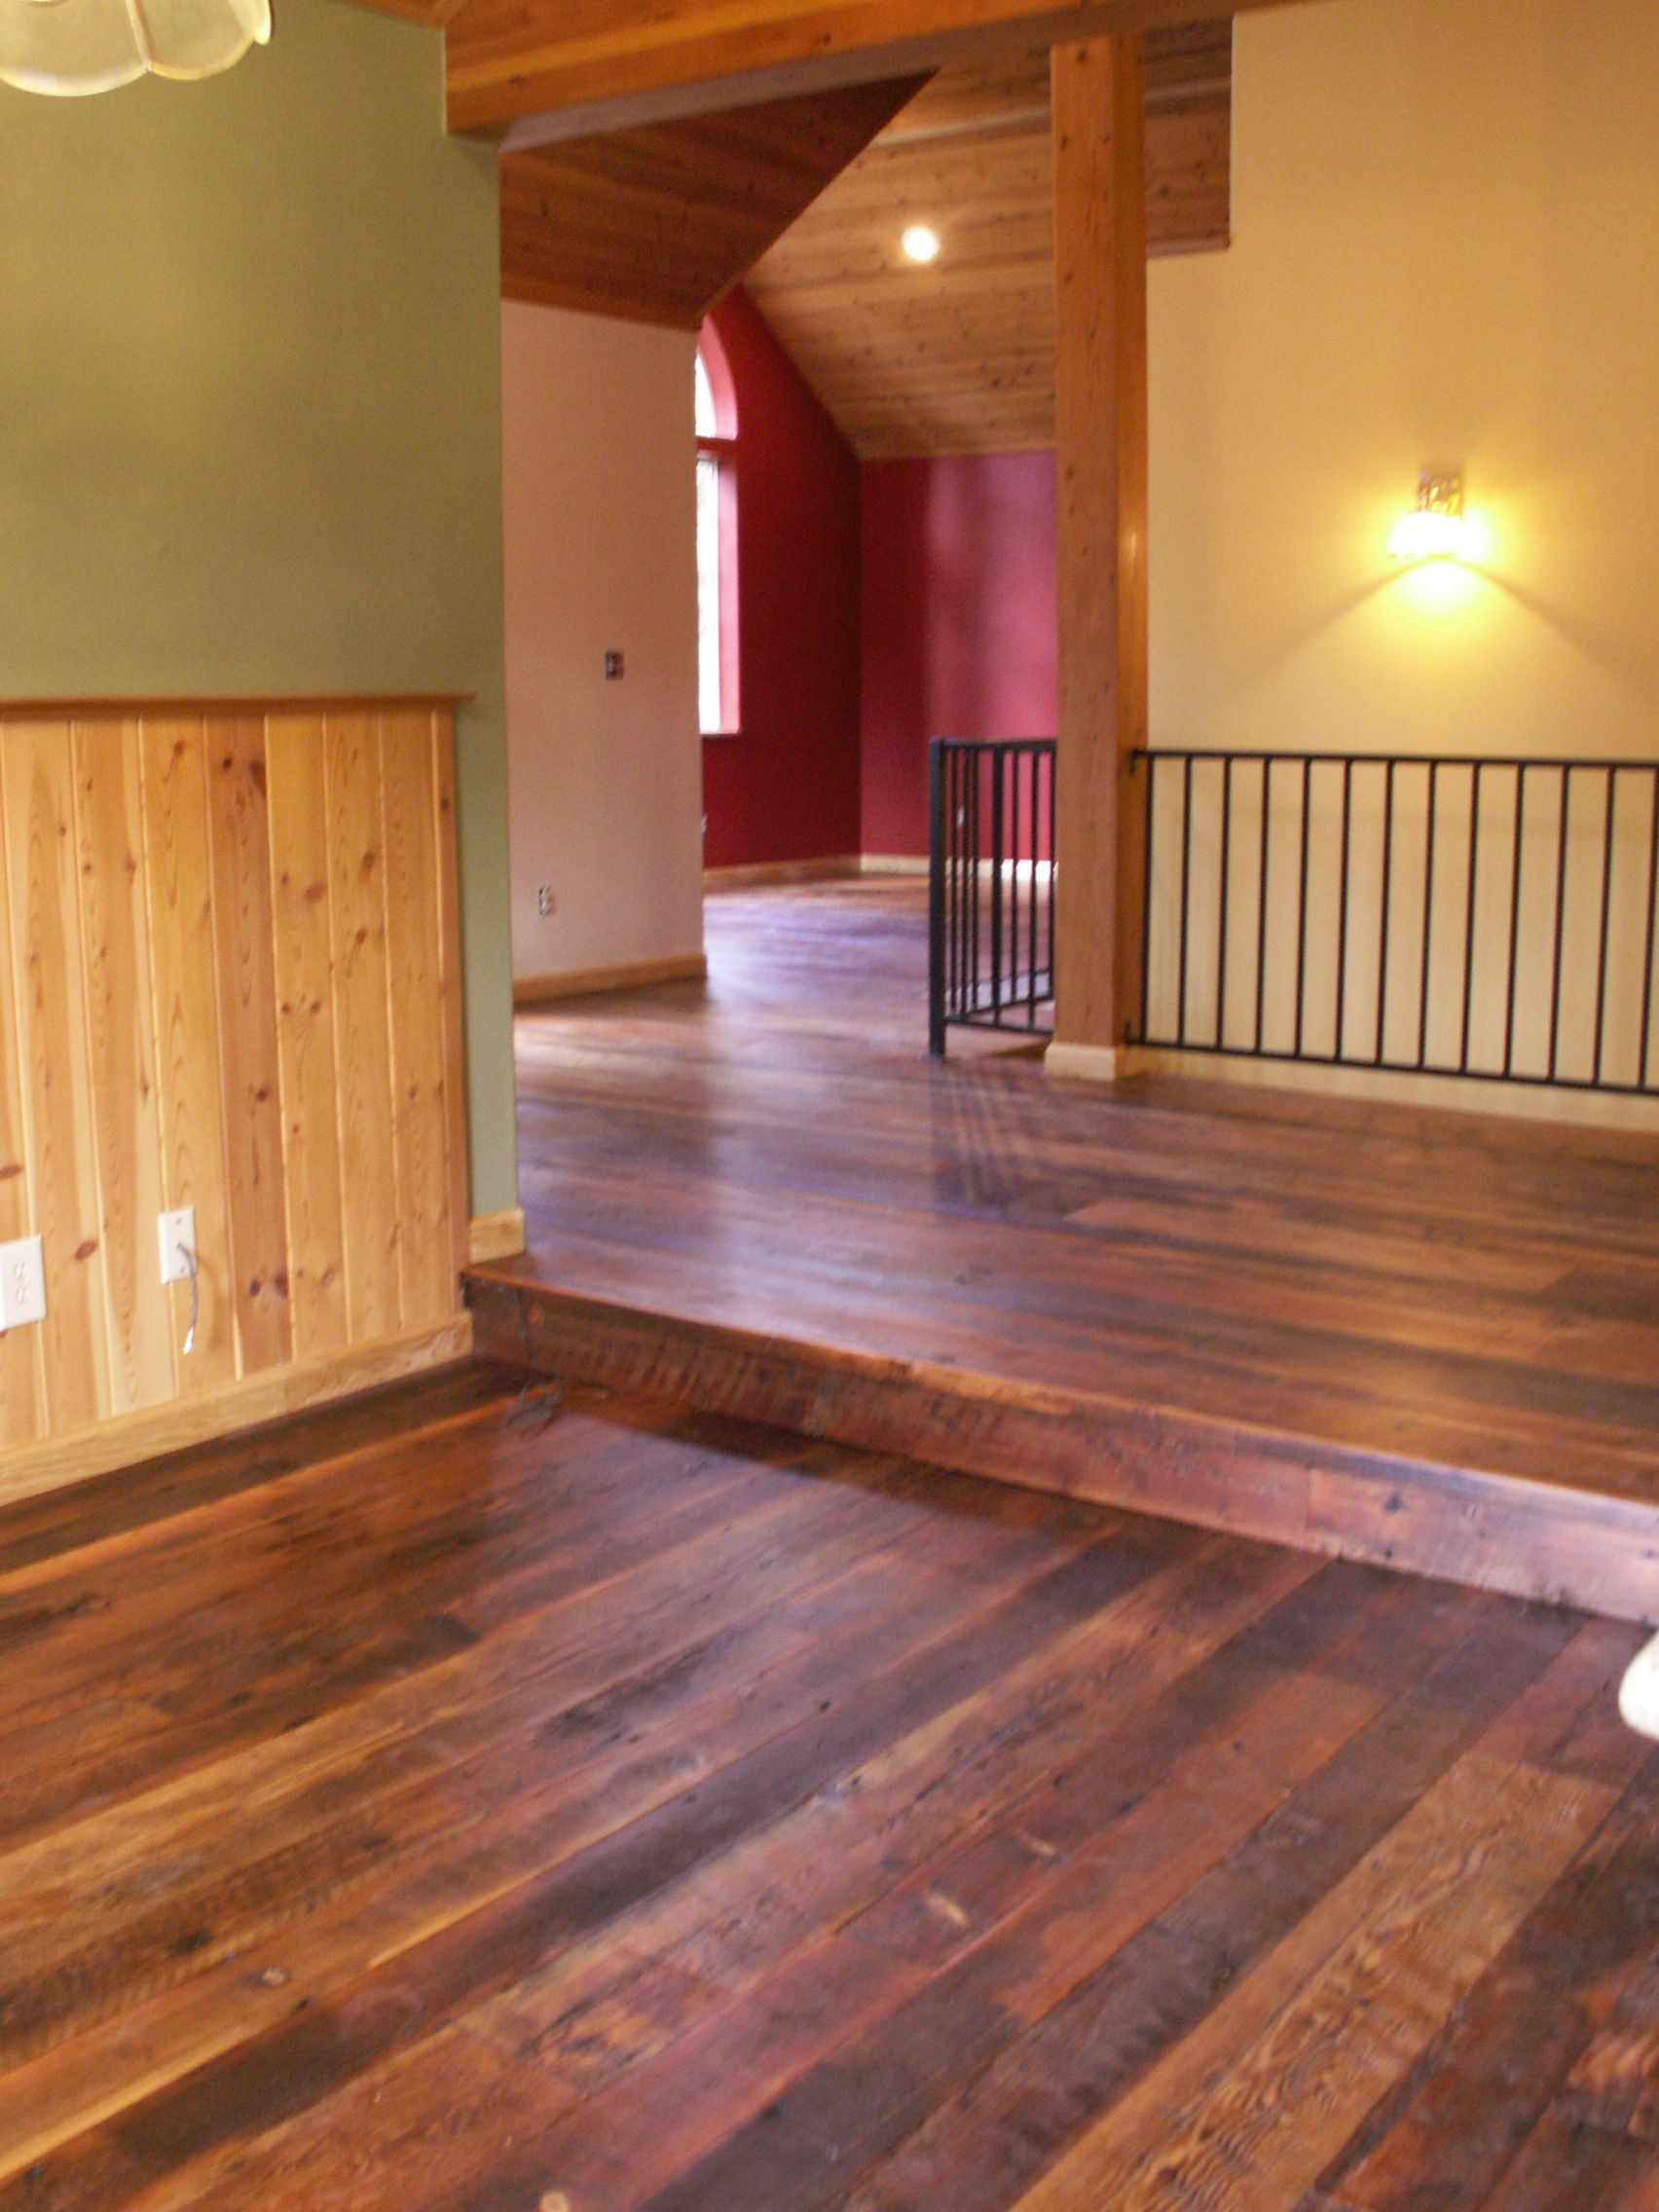 Reclaimed Barn Wood Floors So Pretty